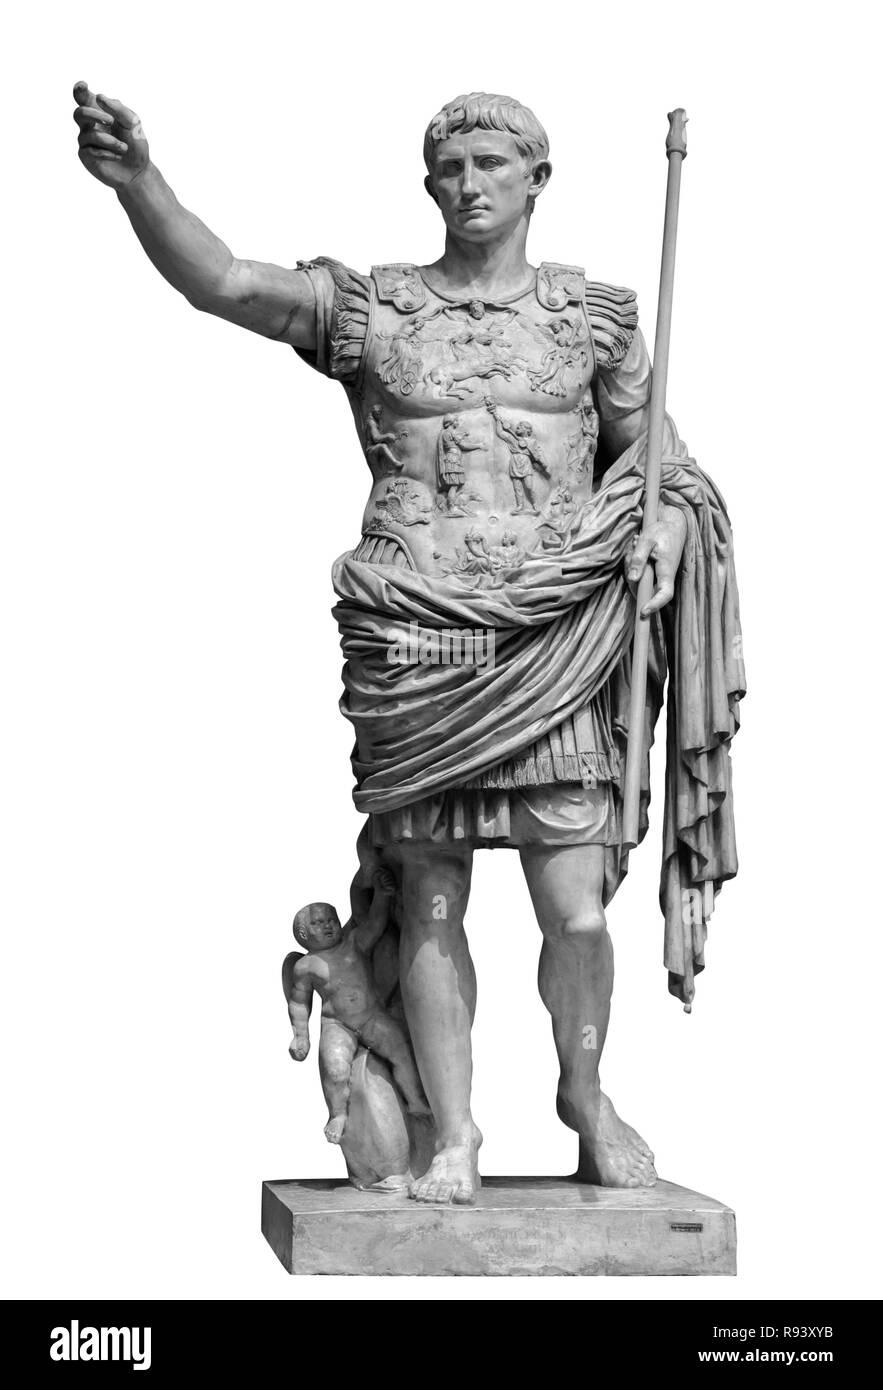 emperor augustus from prima porto statue isolated